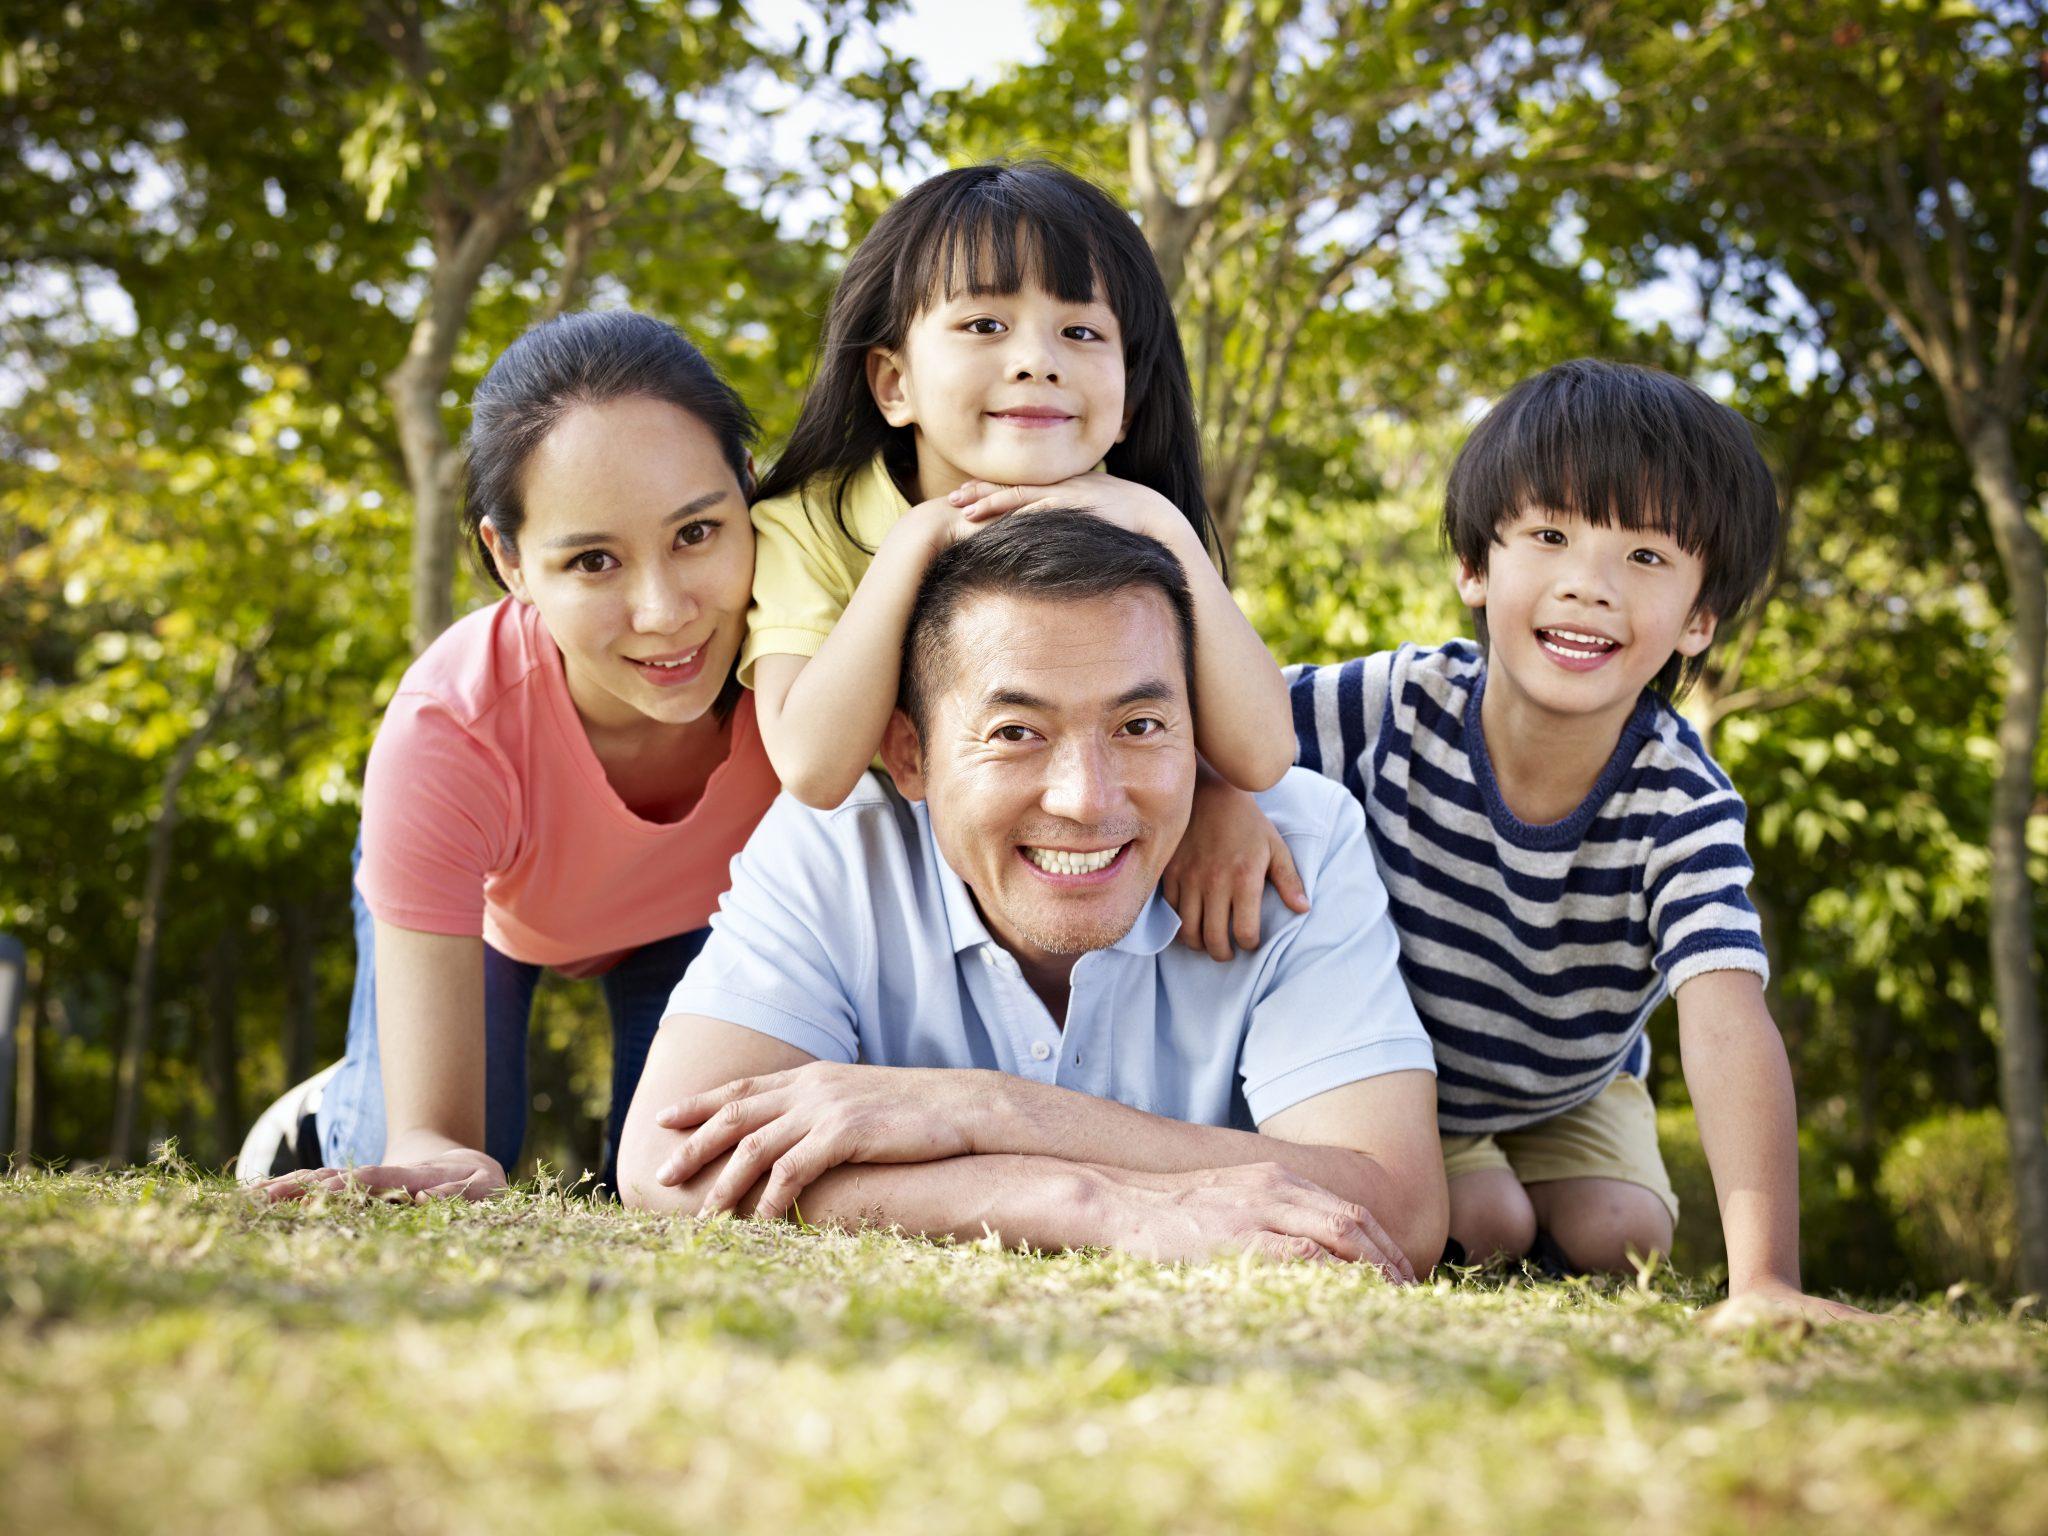 Refinance Mortgage | Brampton Mortgage Broker - Rumy Gill